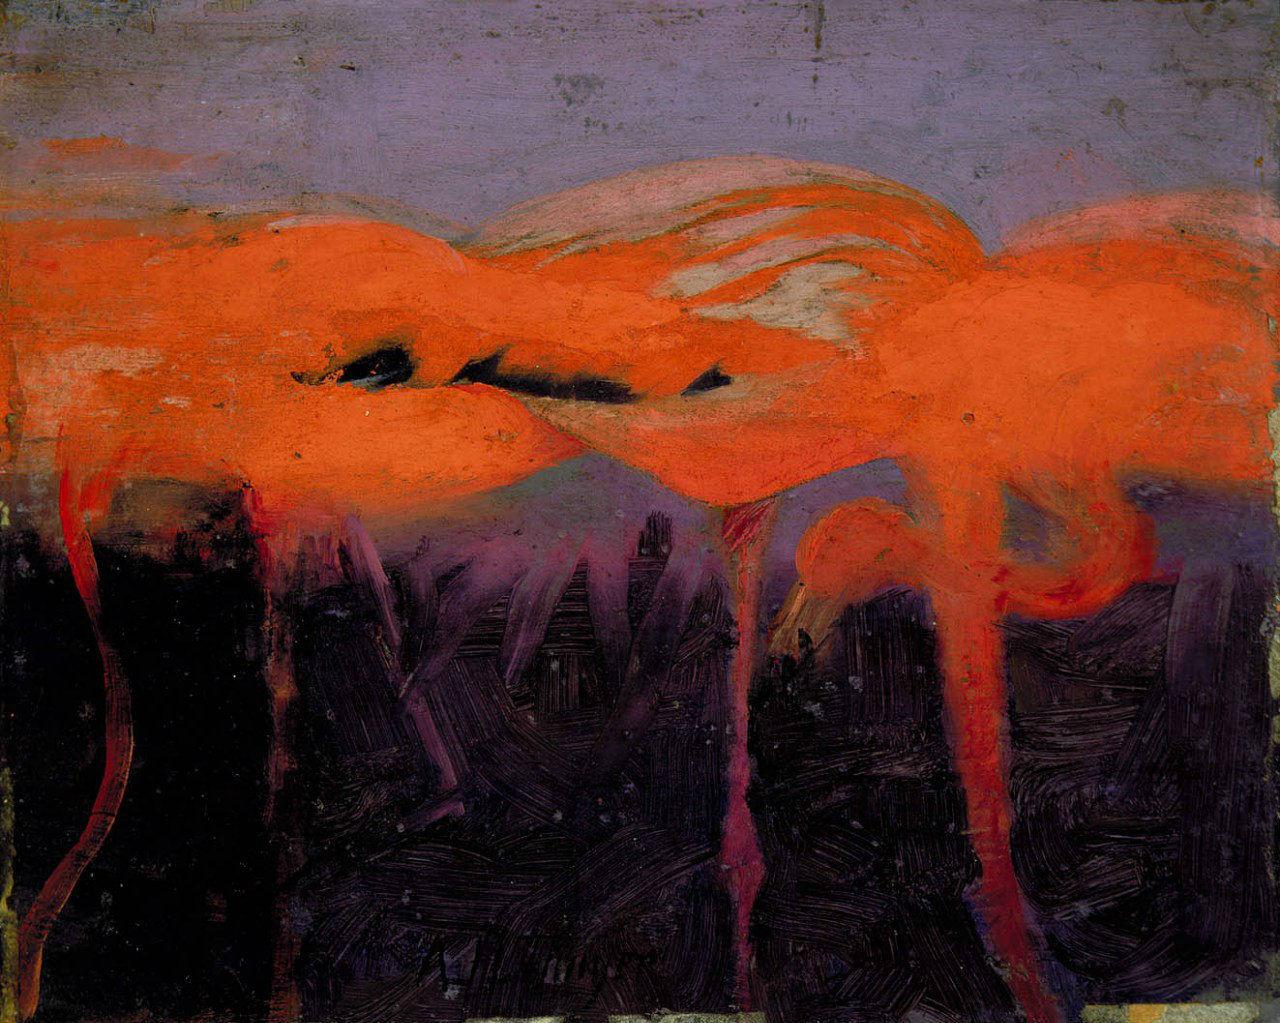 Abbott Handerson Thayer - Red Flamingoes